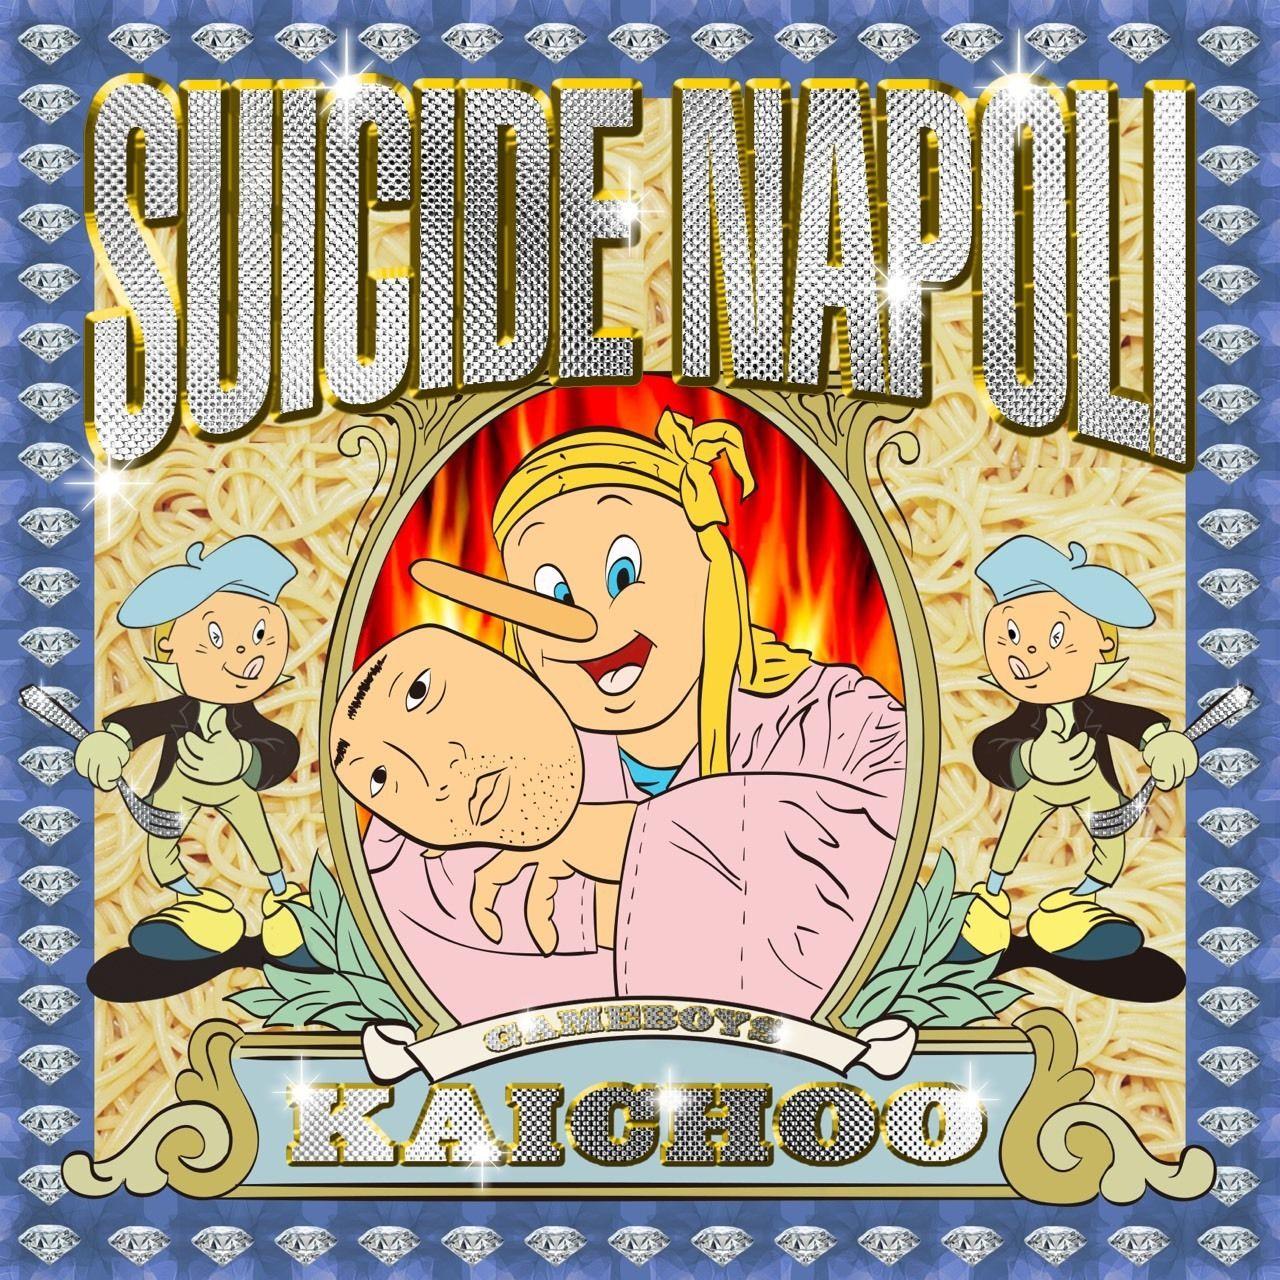 [CD] KAICHOO / $UICIDE NAPOLI